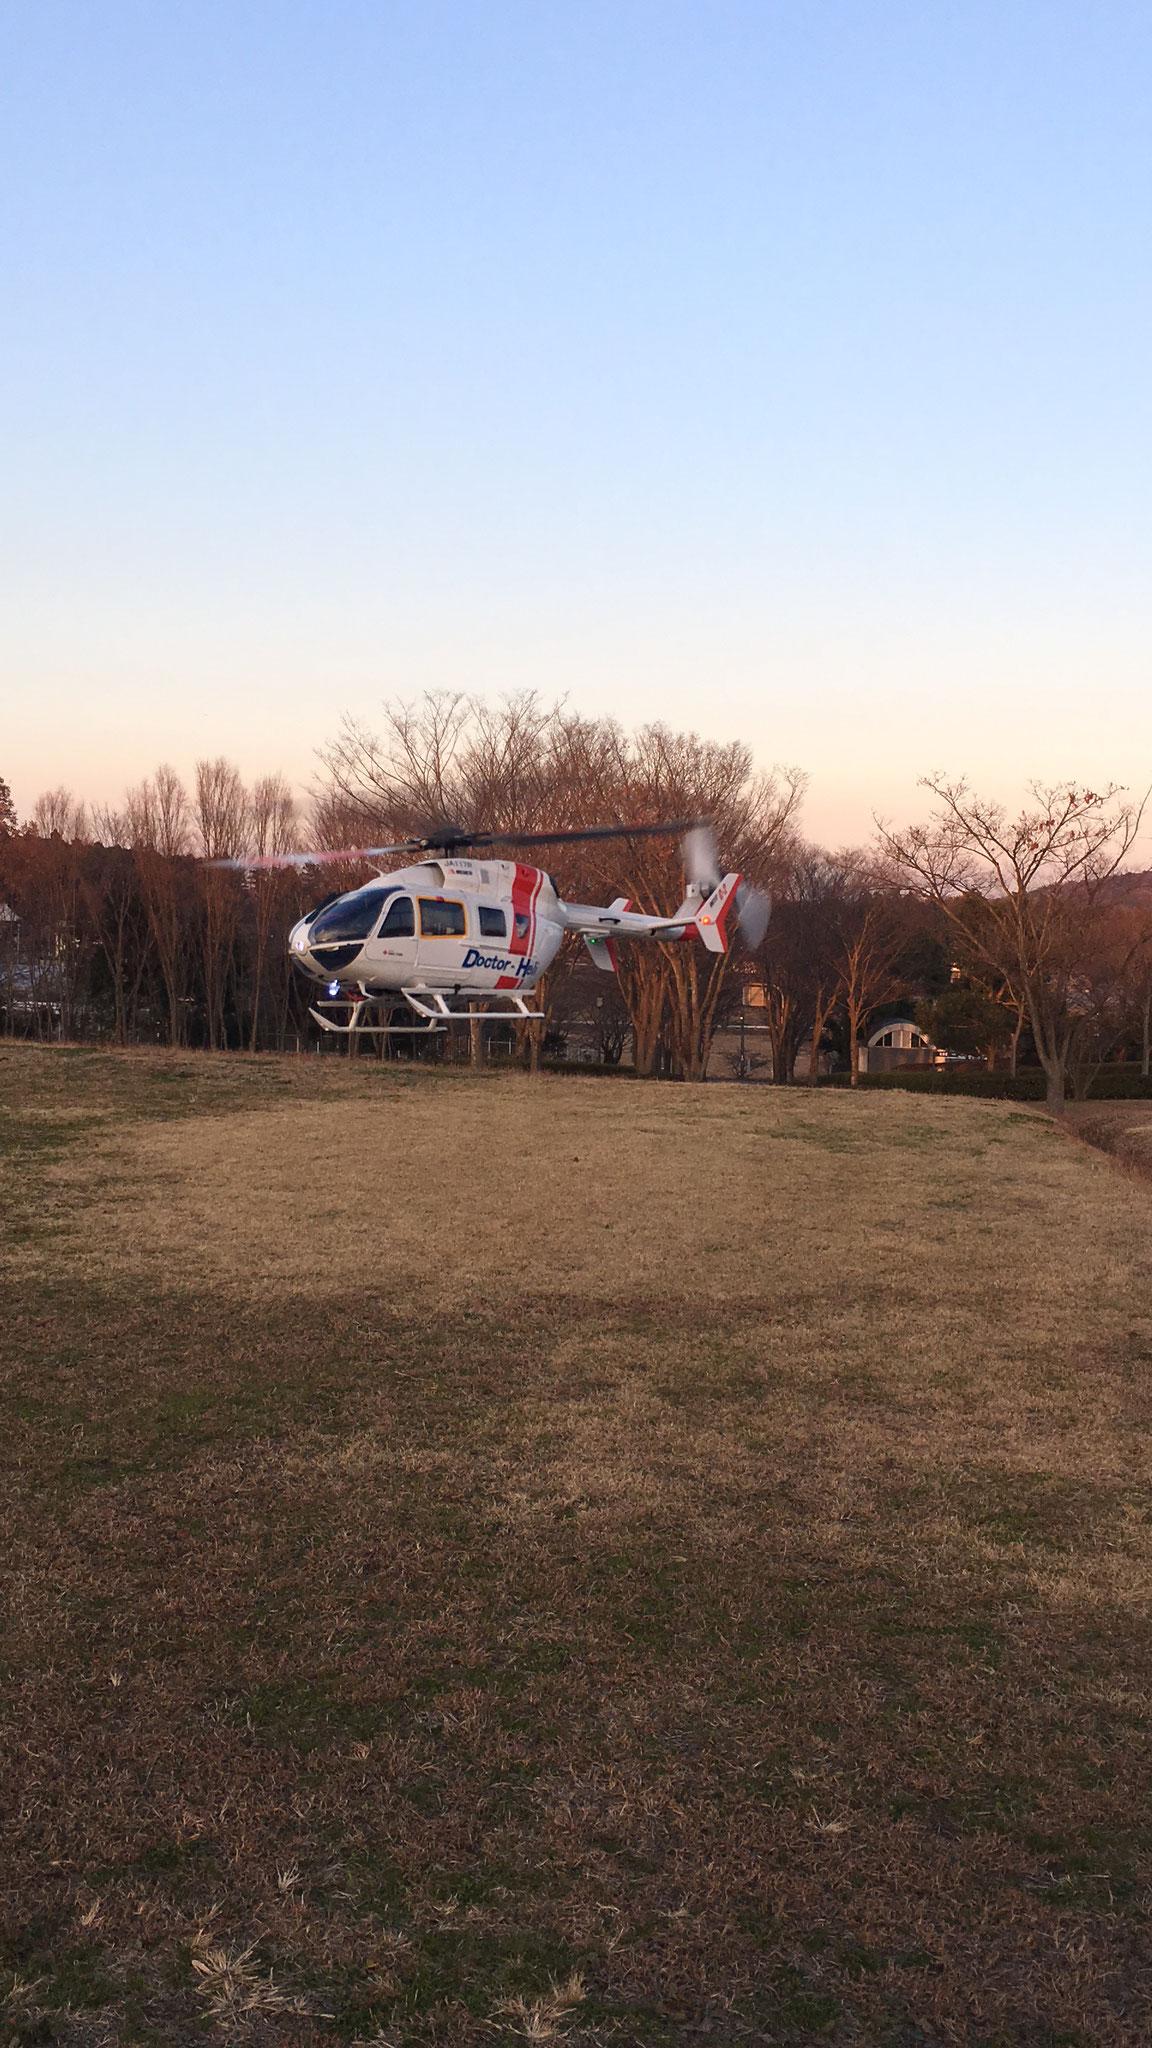 Eurocopter EC145 C2 DOCTOR HELI